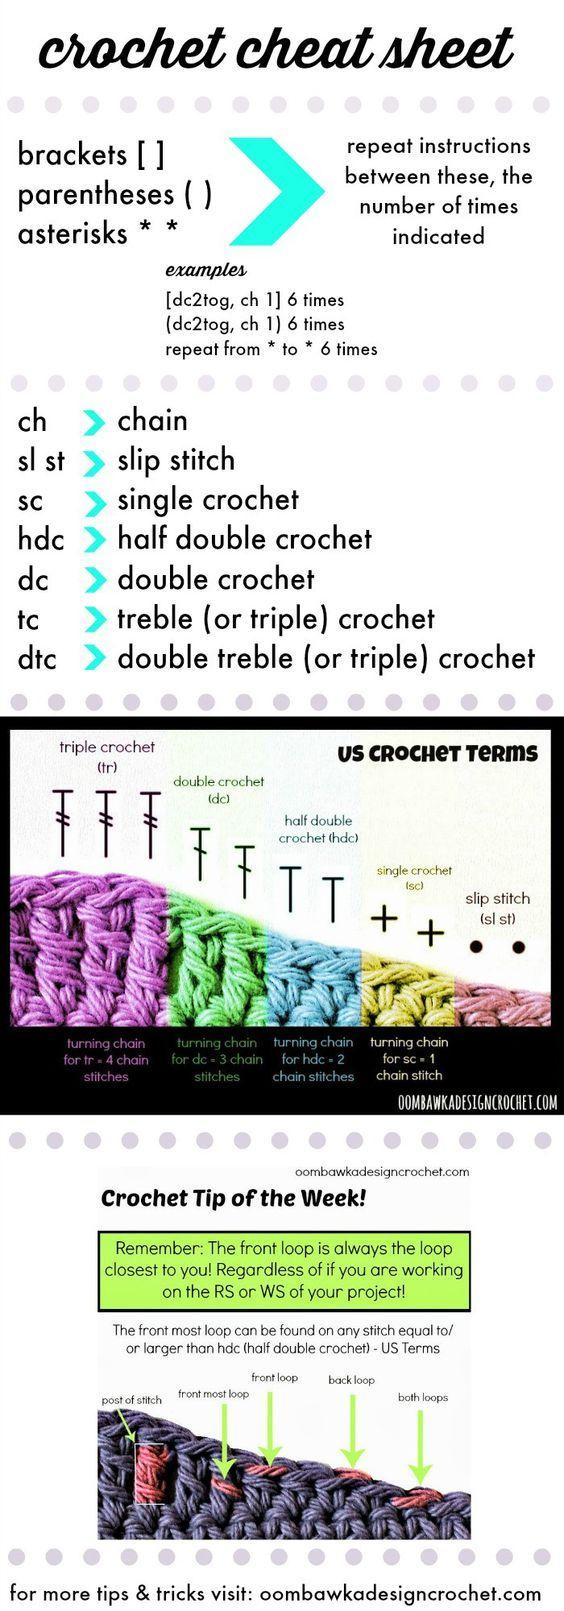 Pin de Ro Aramayo en Crocheting | Pinterest | Patrones de tejido ...